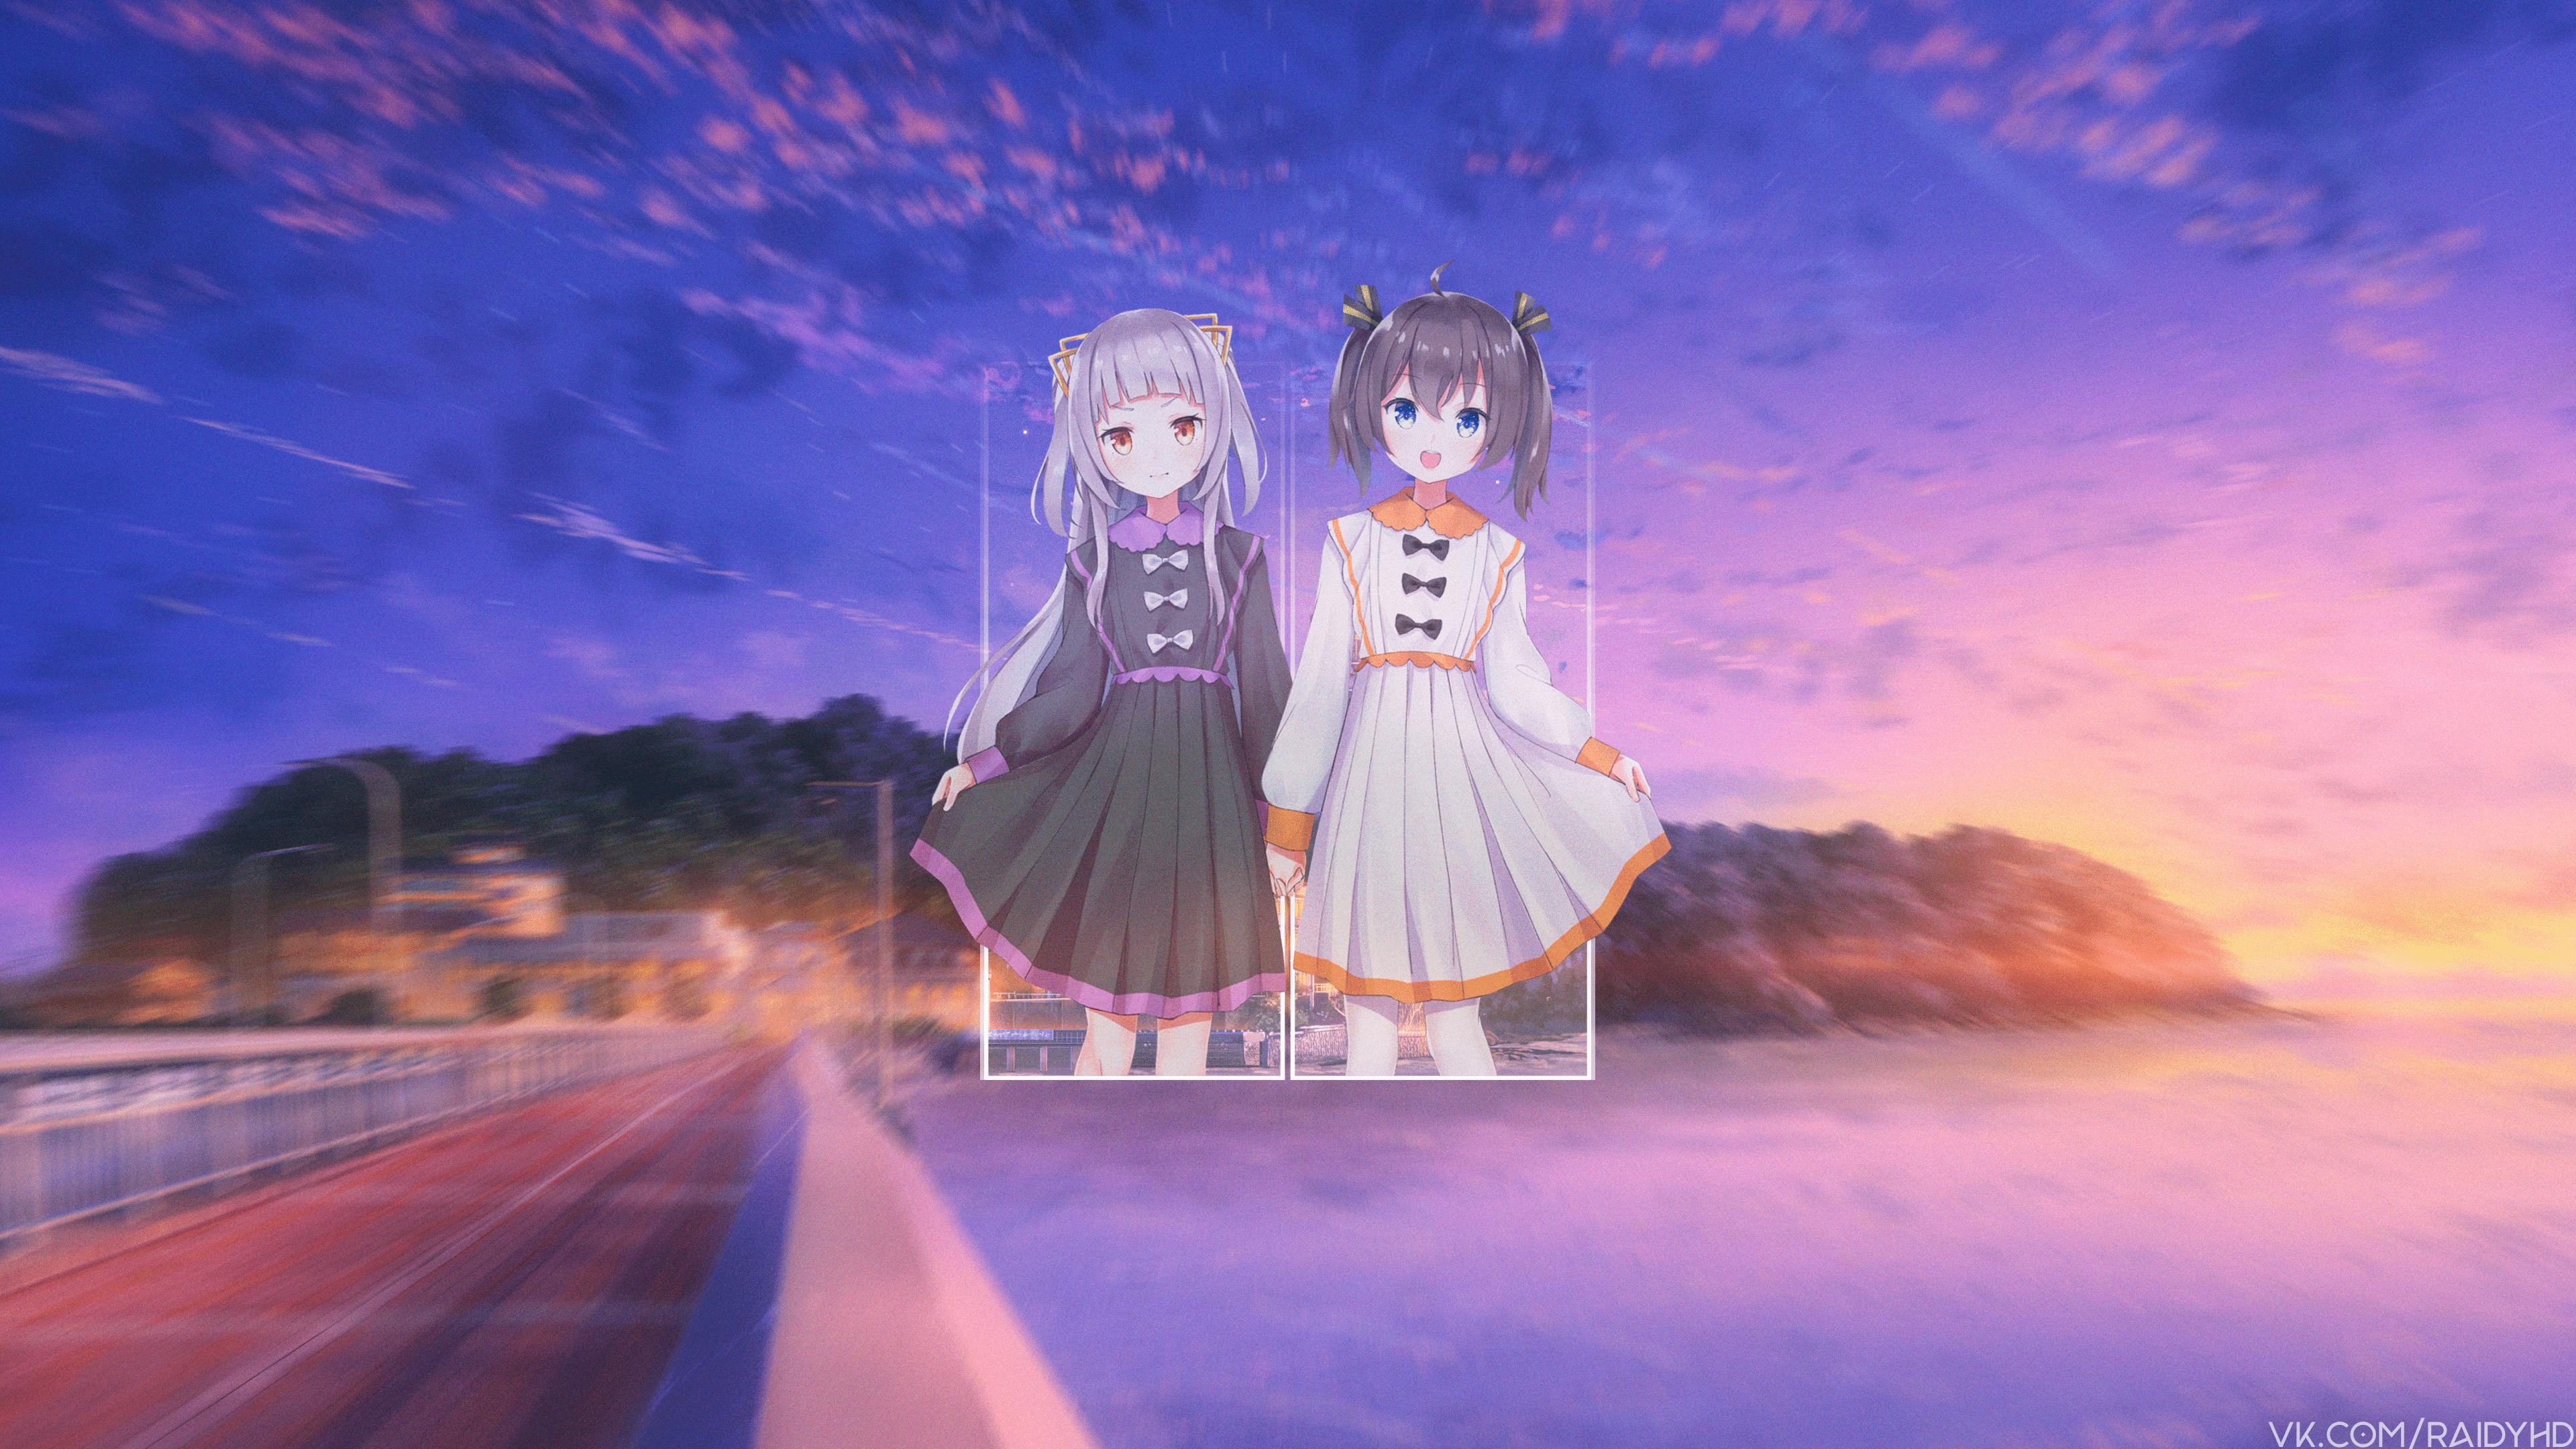 Anime 3840x2160 anime picture-in-picture anime girls sky sunlight road two women dress red eyes blue eyes standing Hololive Virtual Youtuber Natsuiro Matsuri Murasaki Shion